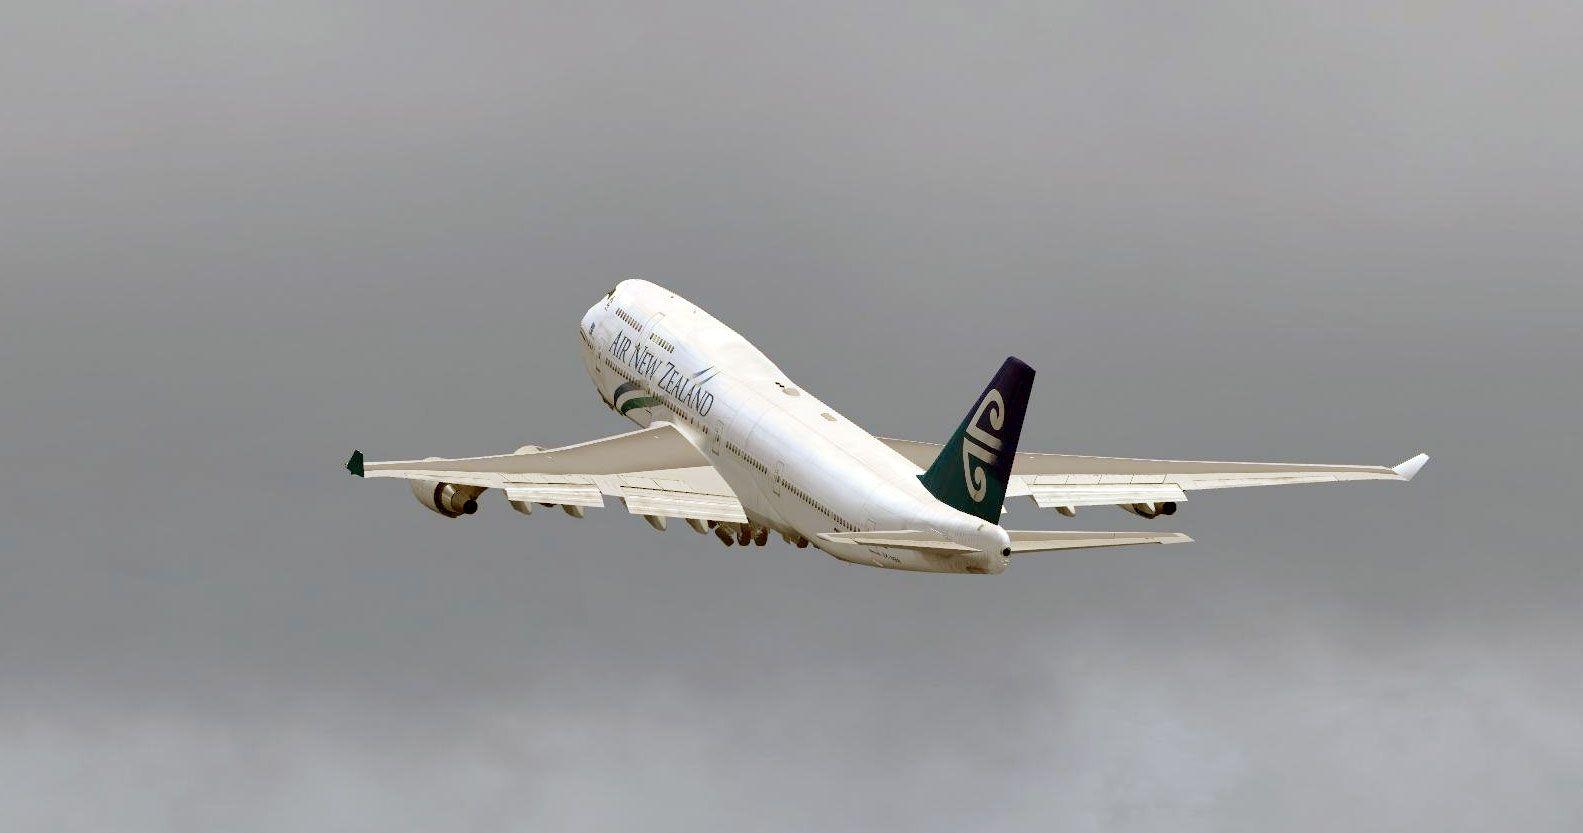 Air New Zealand Boeing 747 taking off in FSX | Delta Flight